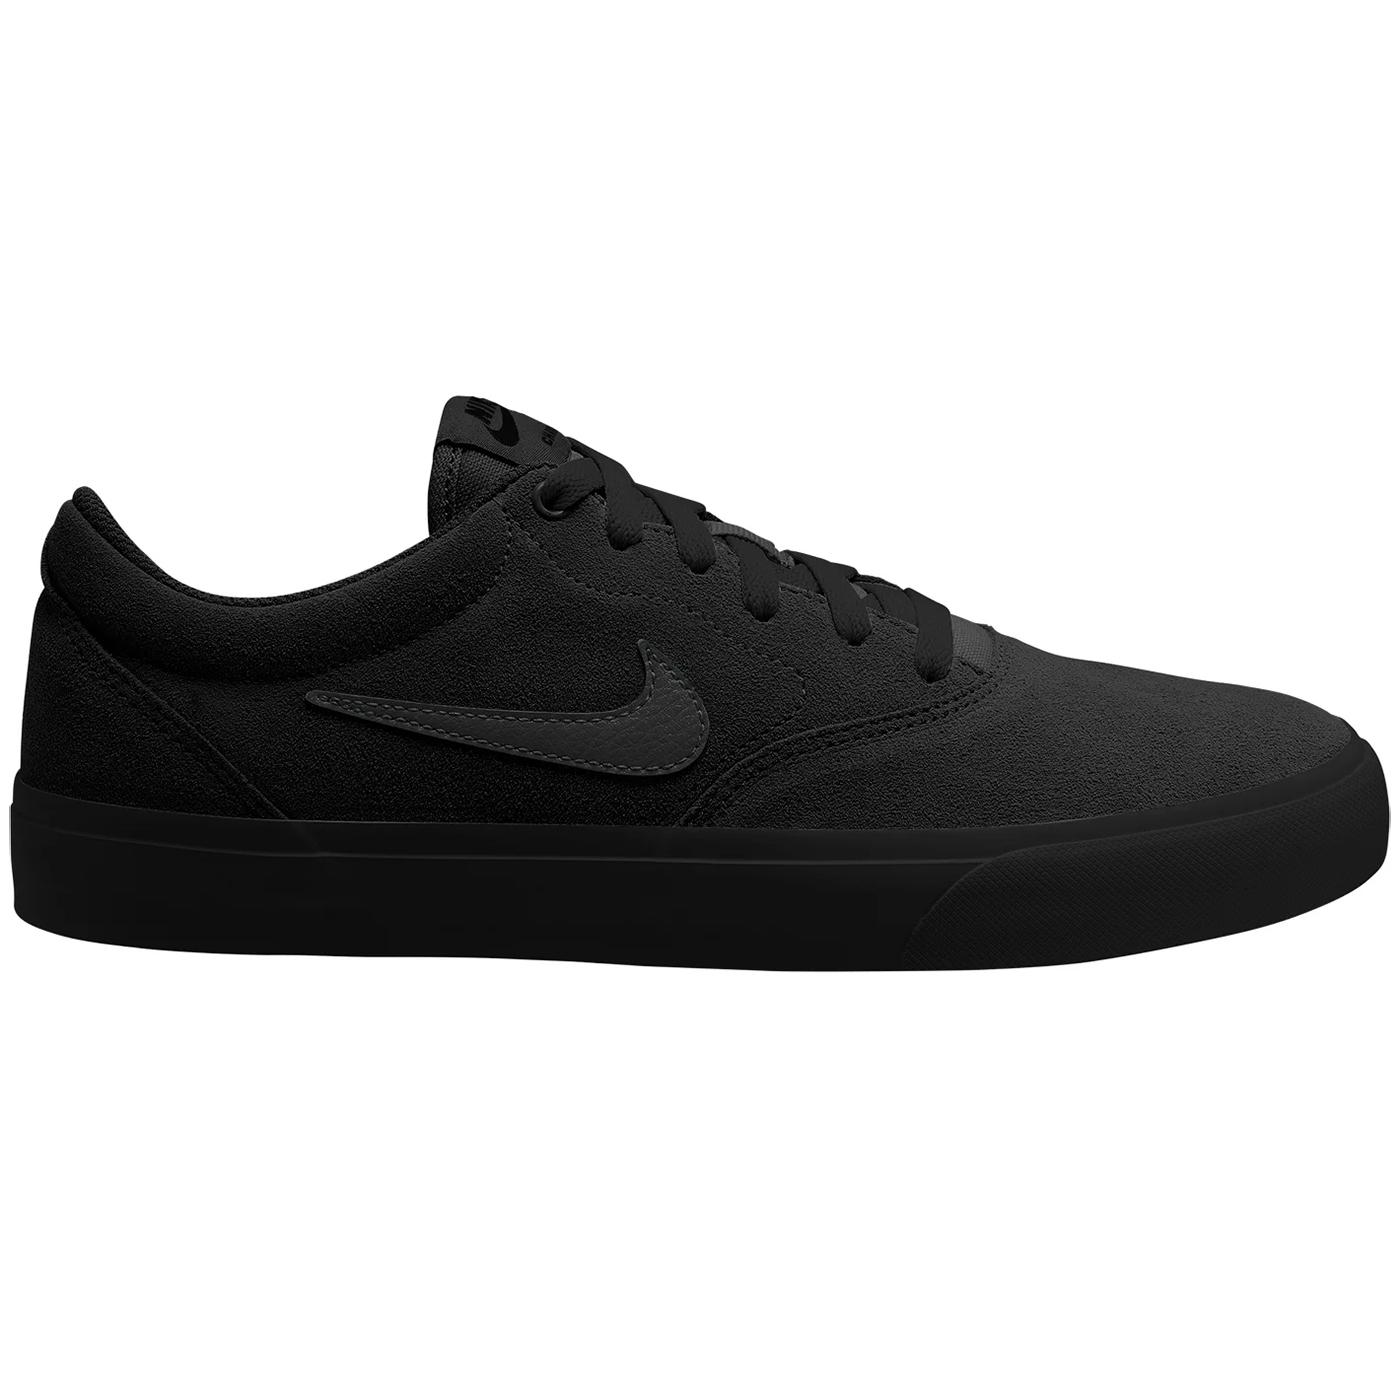 Nike SB Charge Suede Sneaker Skateschuh schwarz CT3463 003